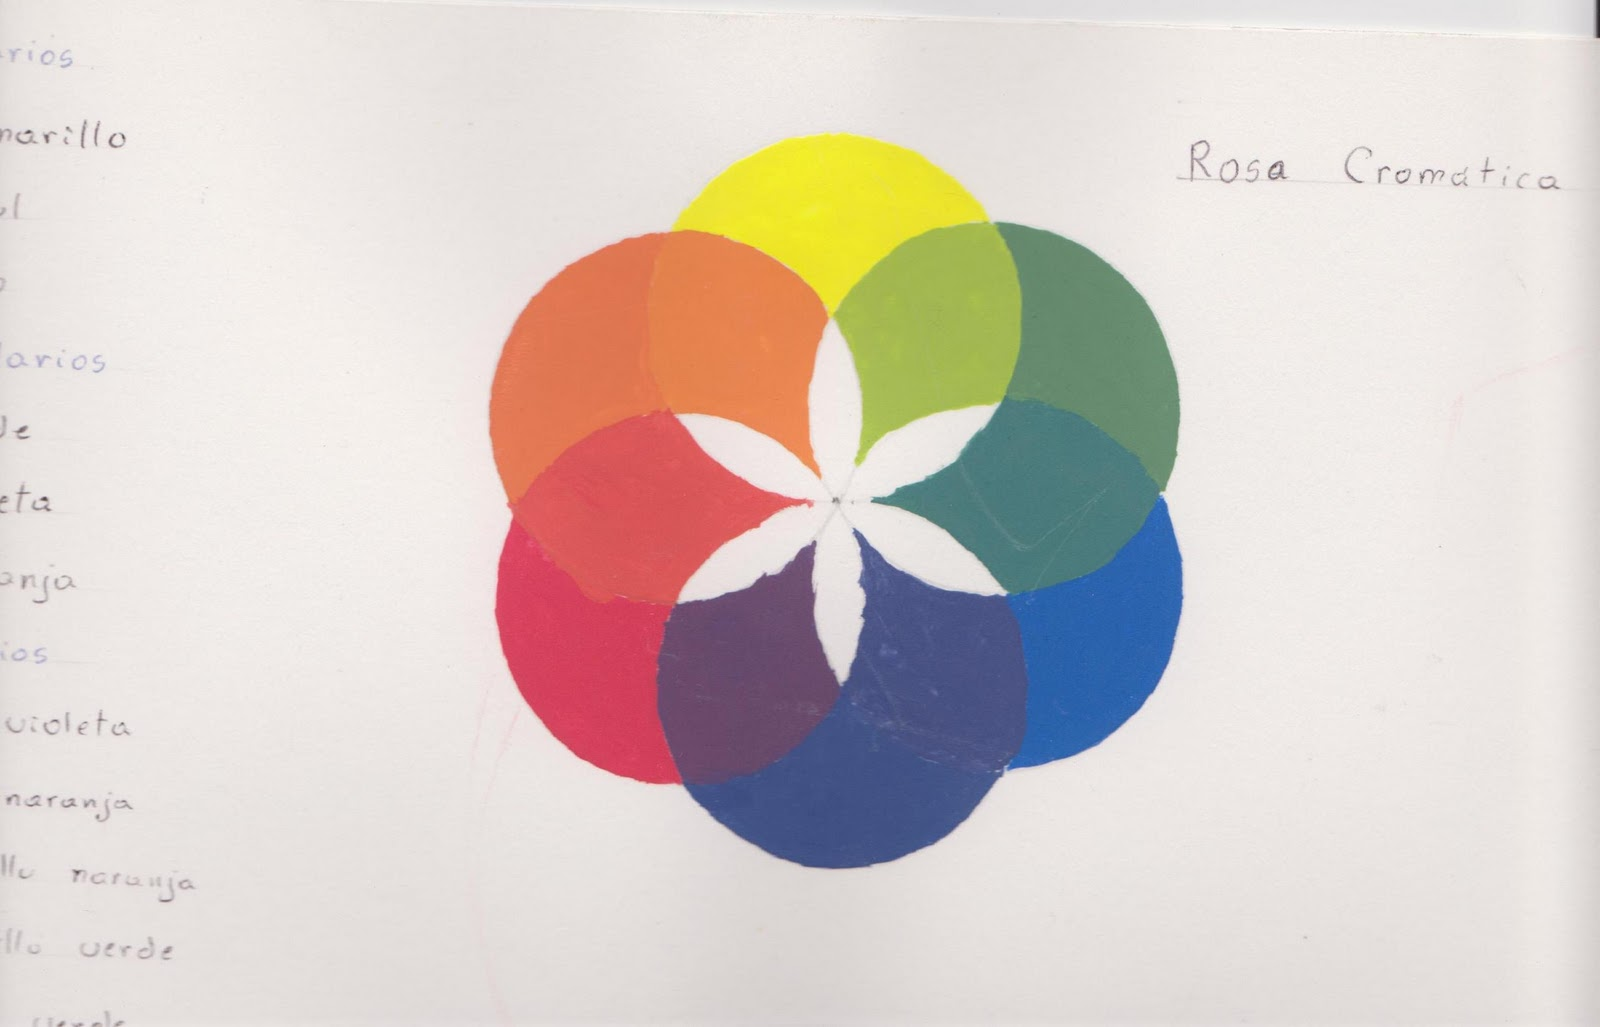 Imagenes De La Rosa De Guadalupe En Dibujo Imagenes De La Rosa De